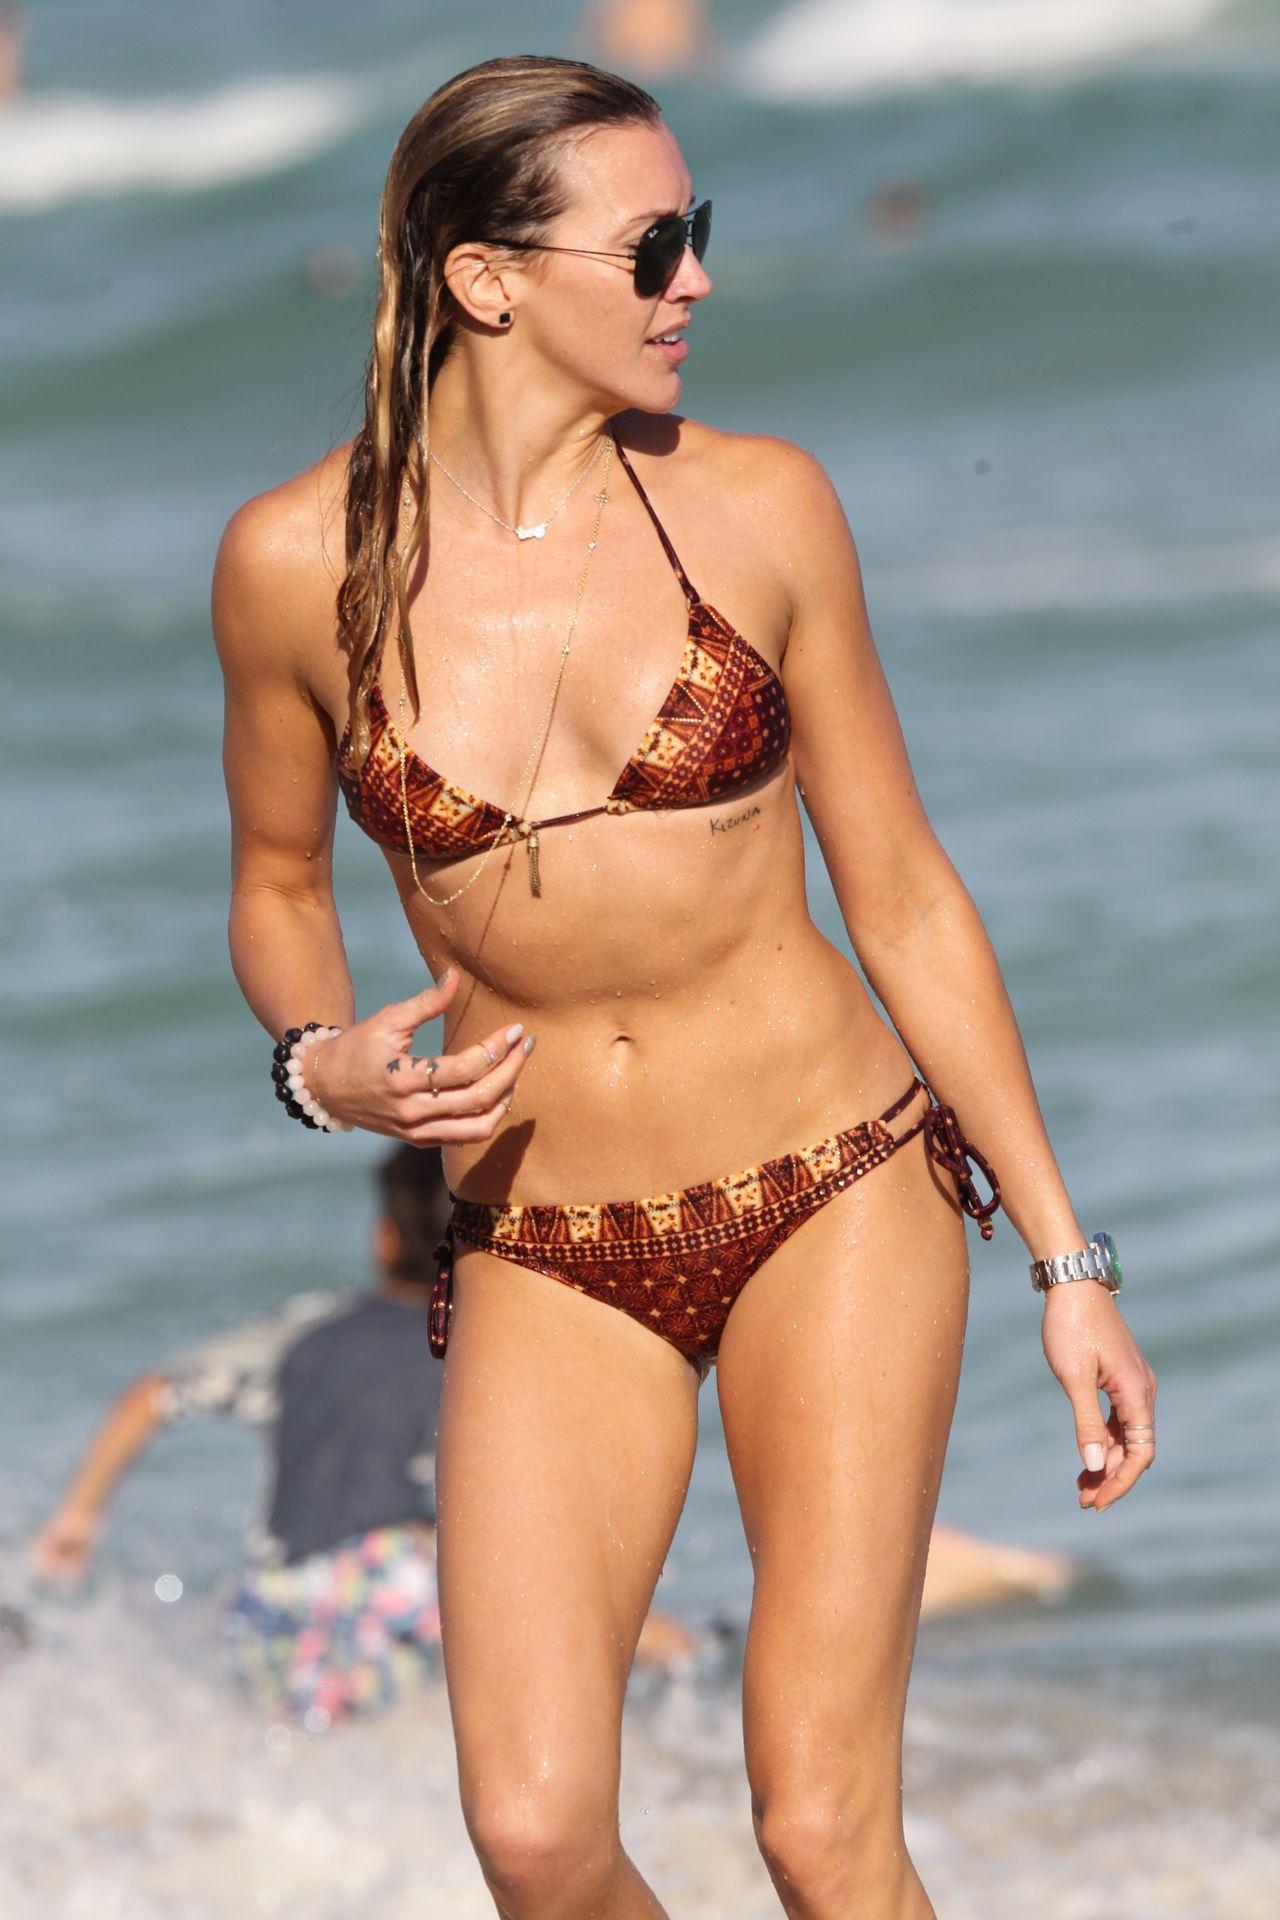 Katie Cassidy Bikini Candids - at the beach, Miami 12/28/2015